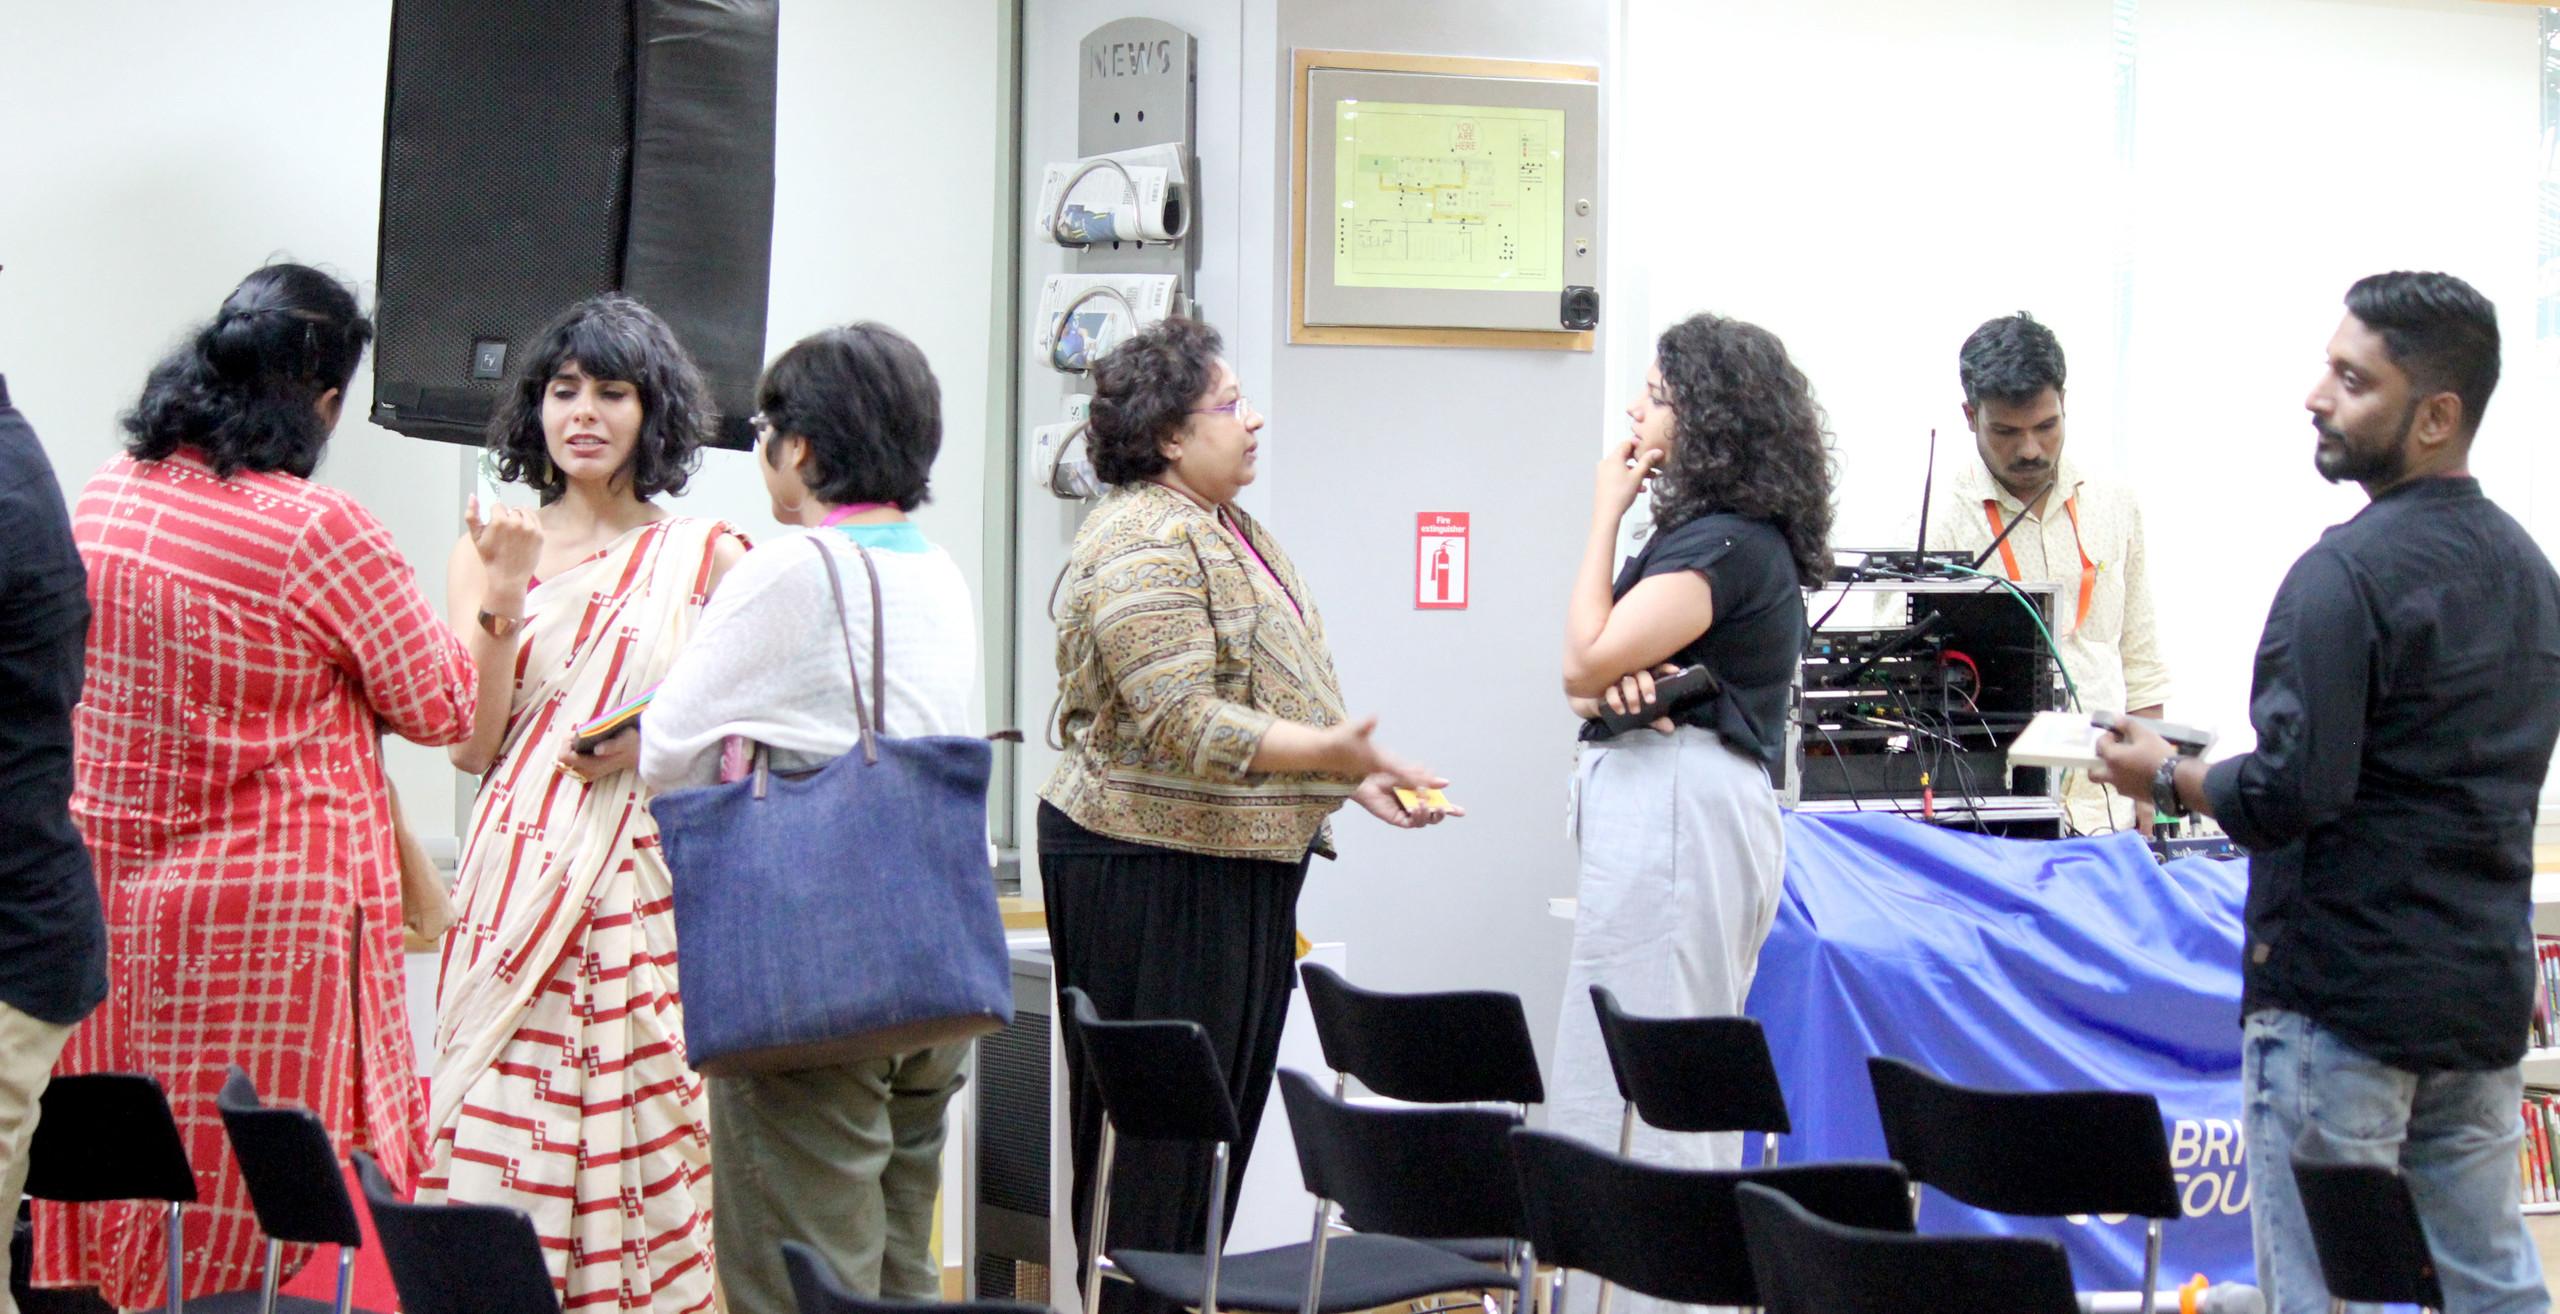 ACRI Bengaluru British Council Festival Connections Babitha George Rashmi Dhanwani Divya Galagali Abhishek Madan